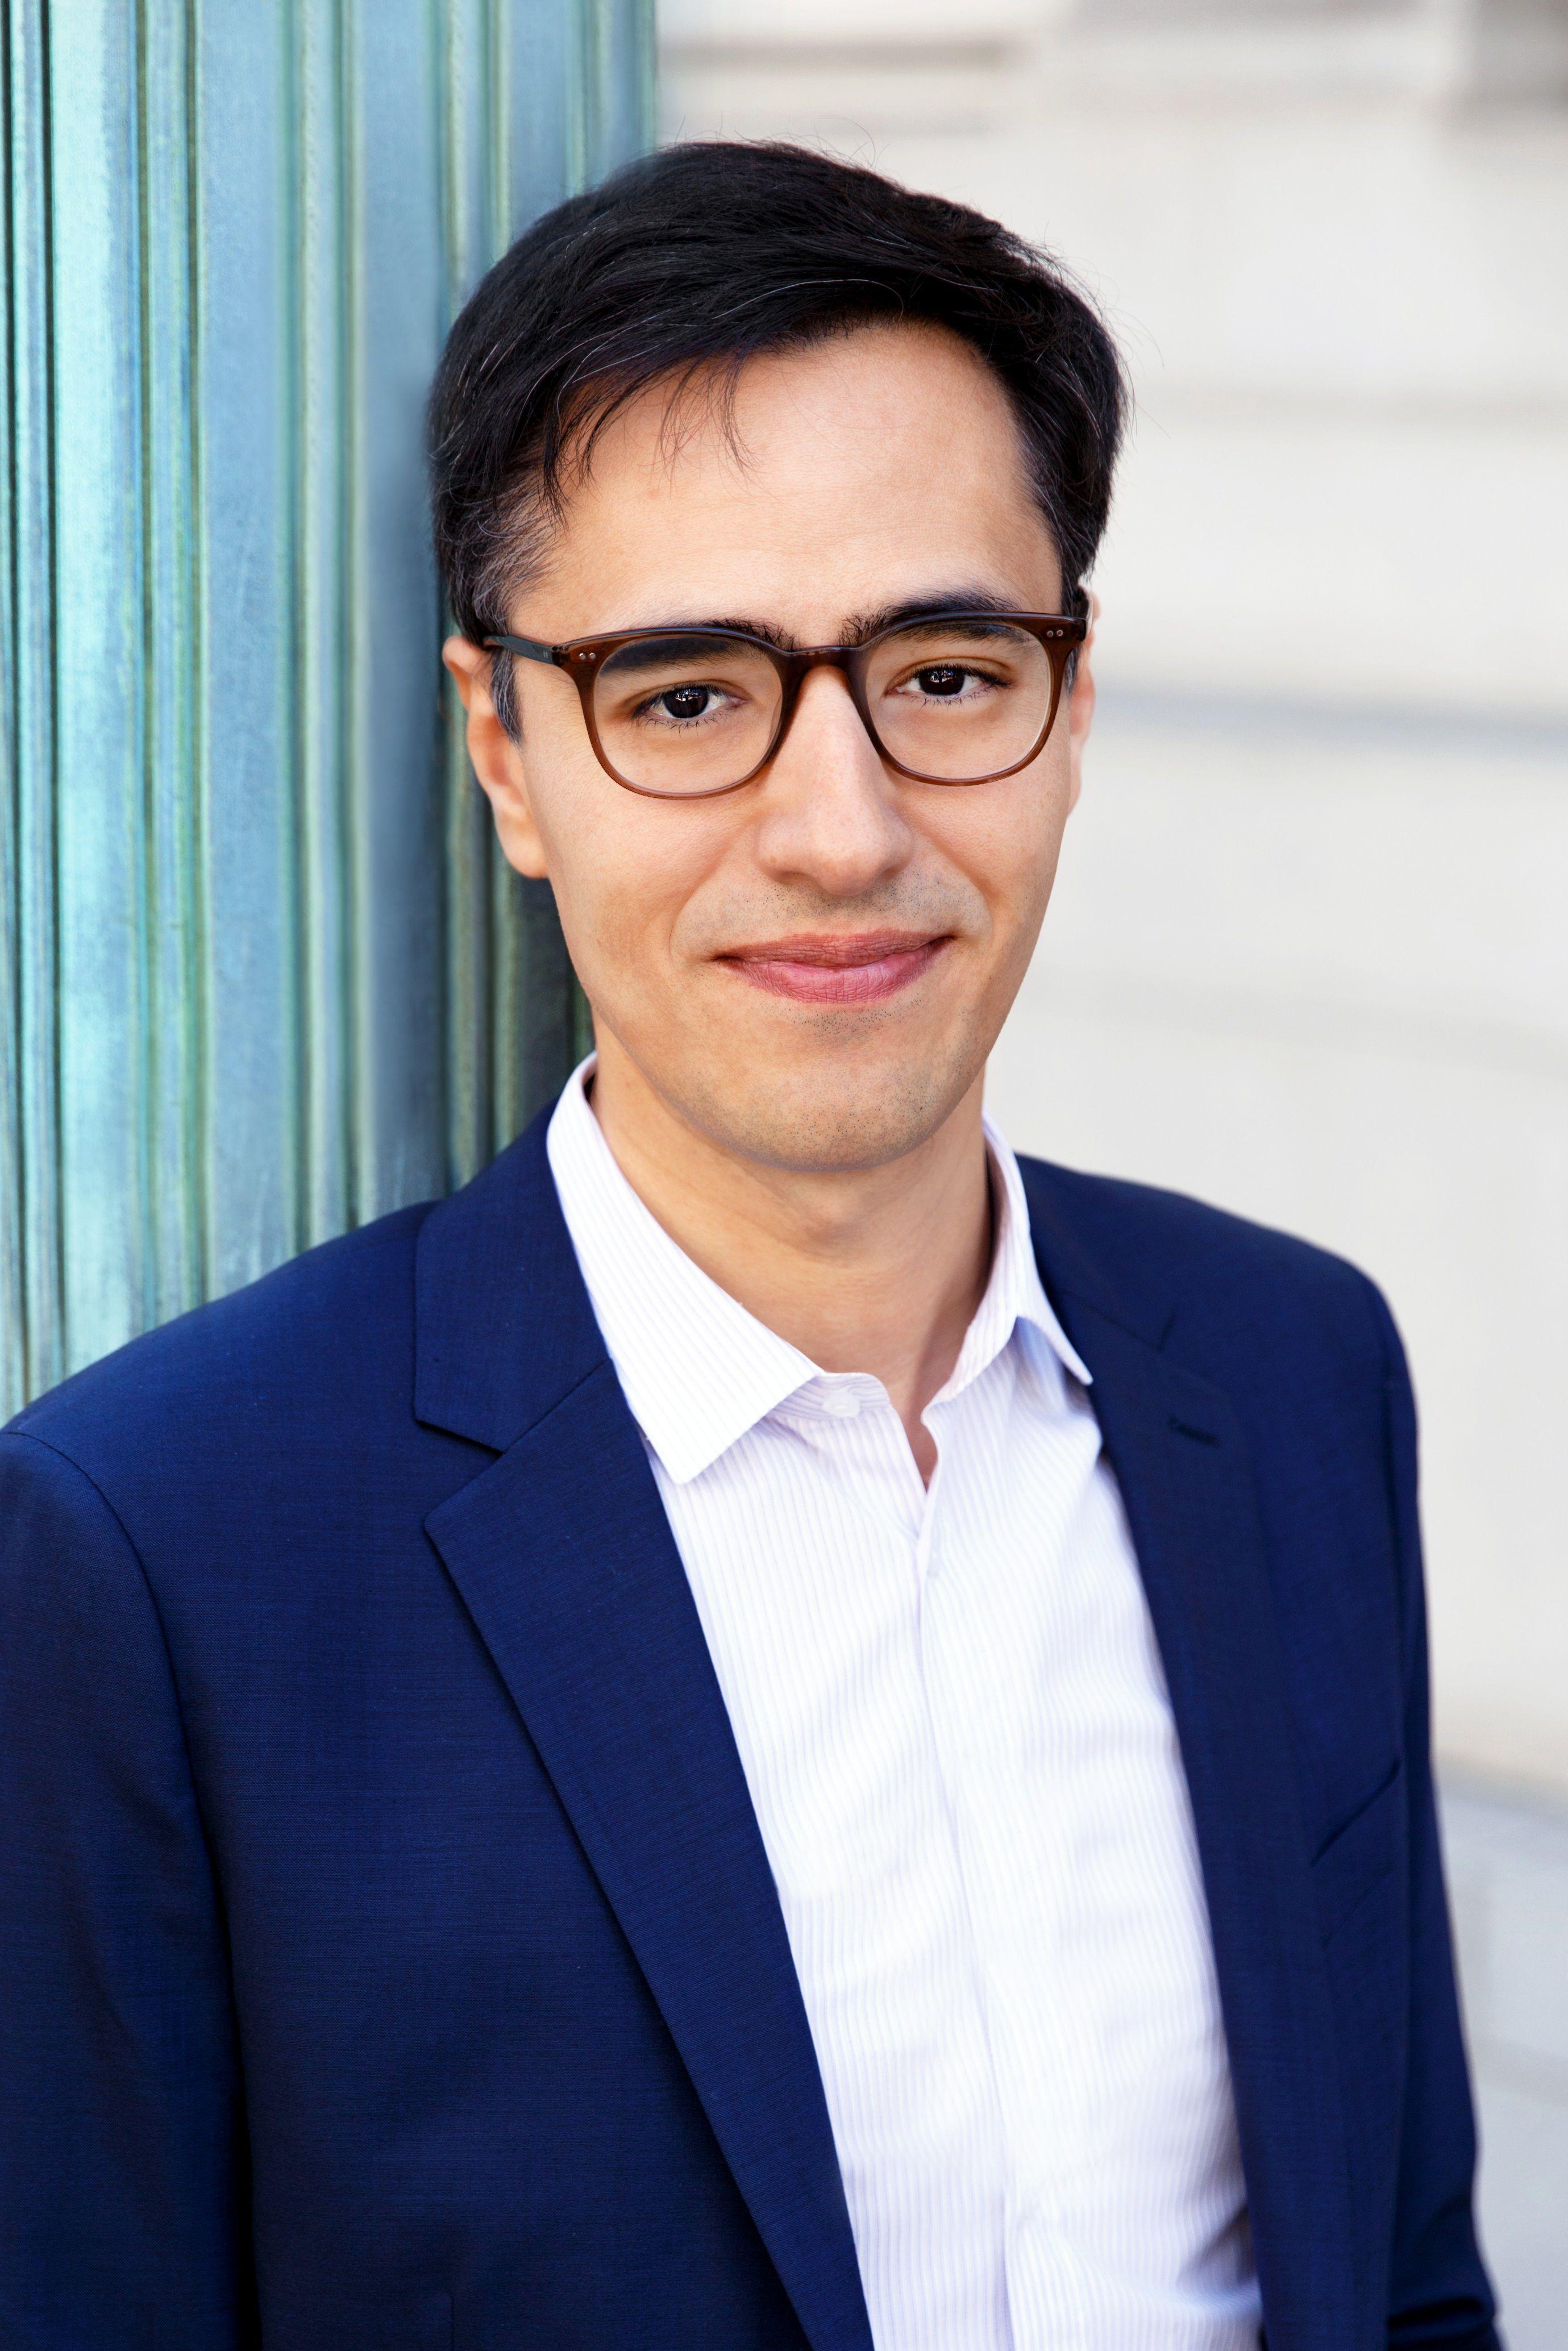 Andre Mura